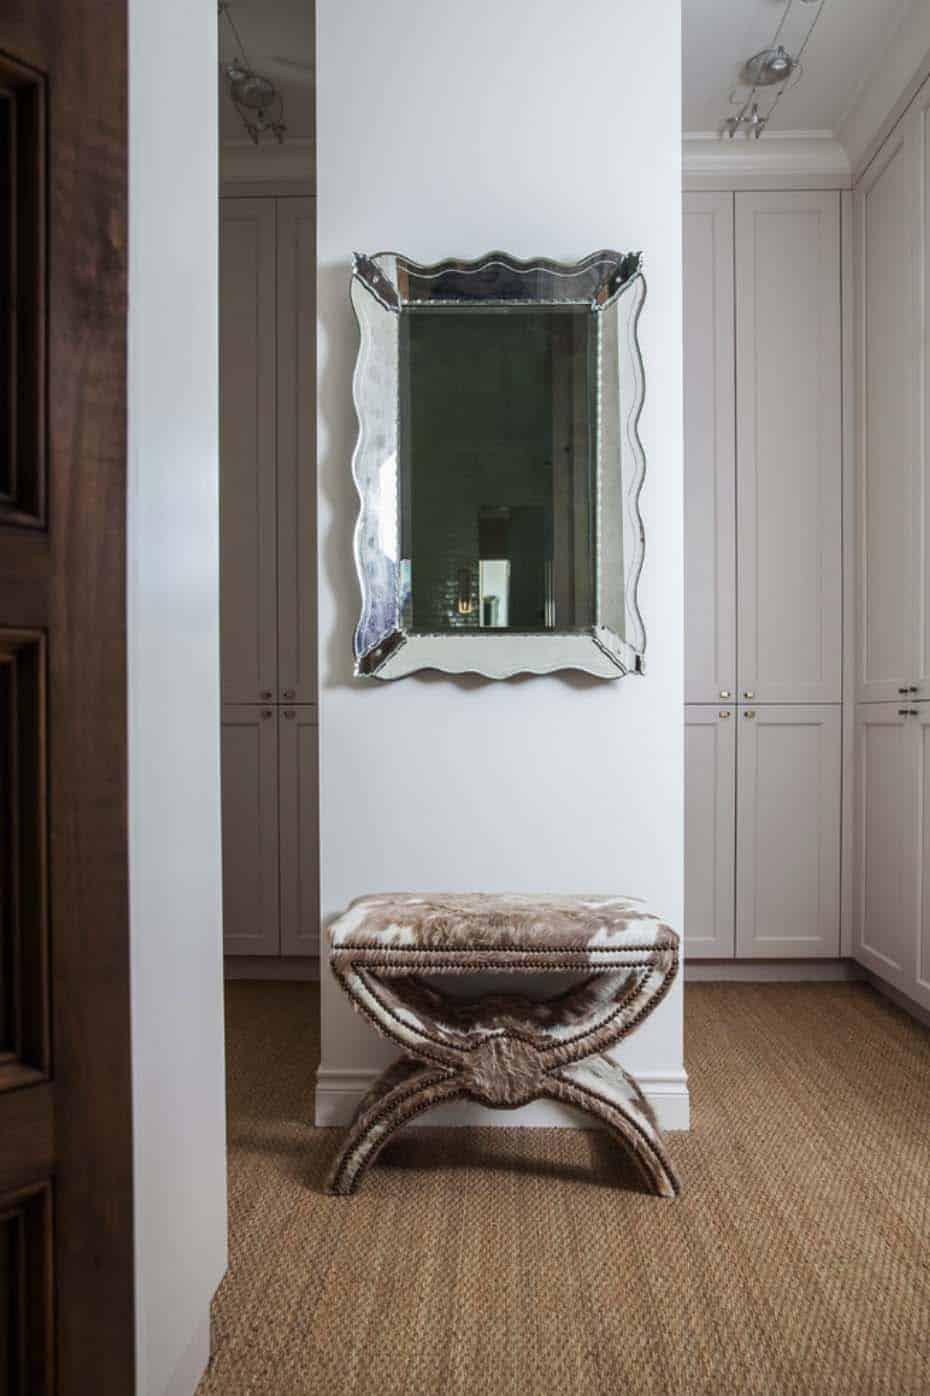 Maison de style méditerranéen-Marie Flanigan Interiors-21-1 Kindesign